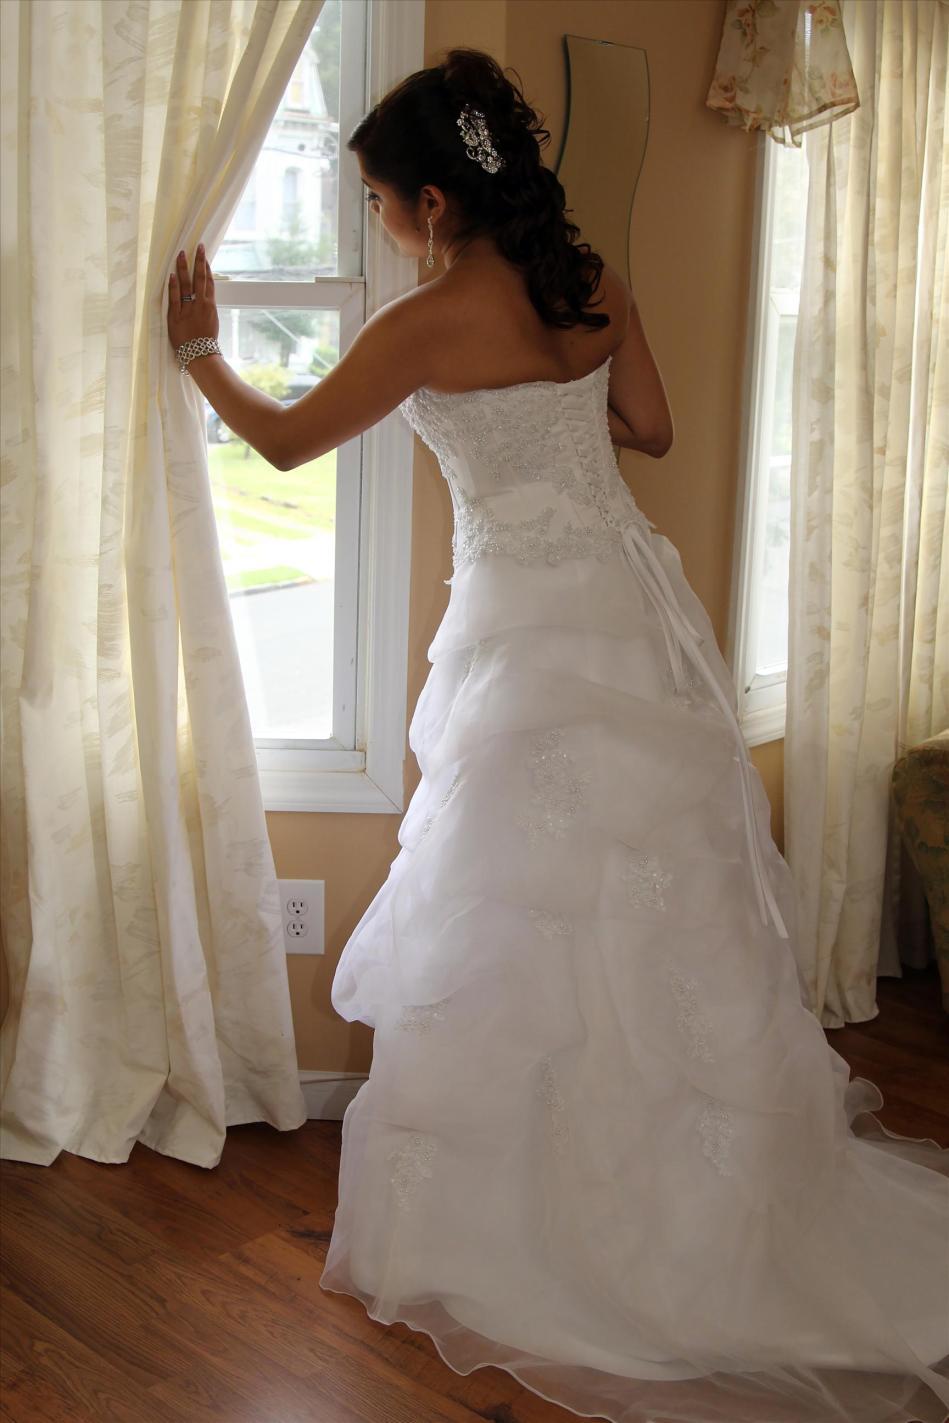 bridalprep.weddingphotos.apicturesquememoryphotography